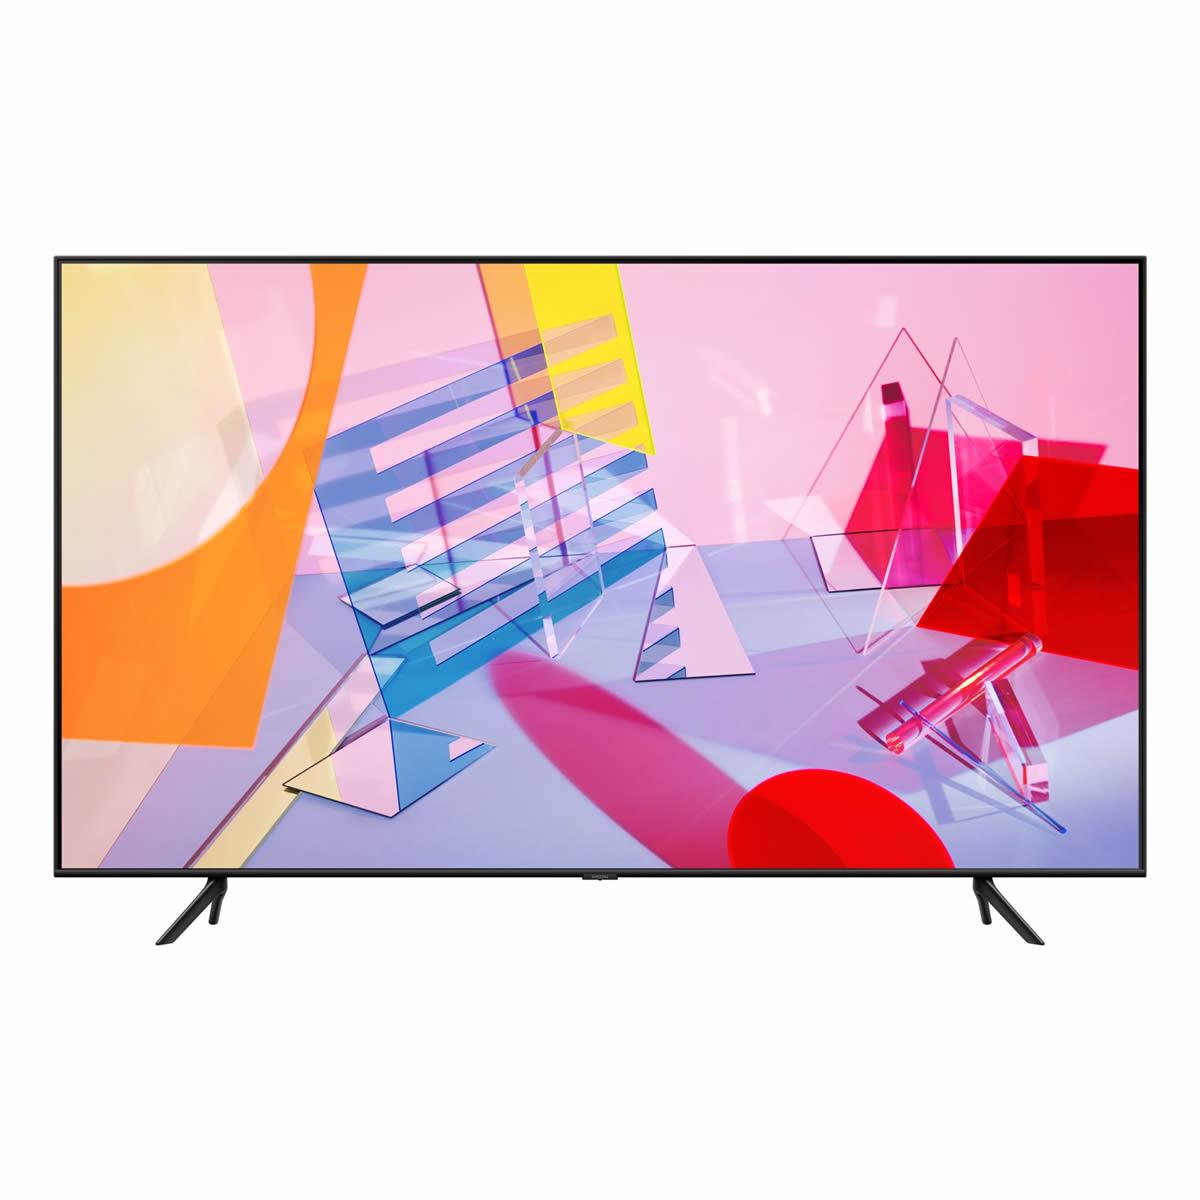 "Samsung QE50Q60TA 50"" Smart 4K Ultra HD QLED TV With Quantum Processor, Ambient Mode and Game Enhancer"